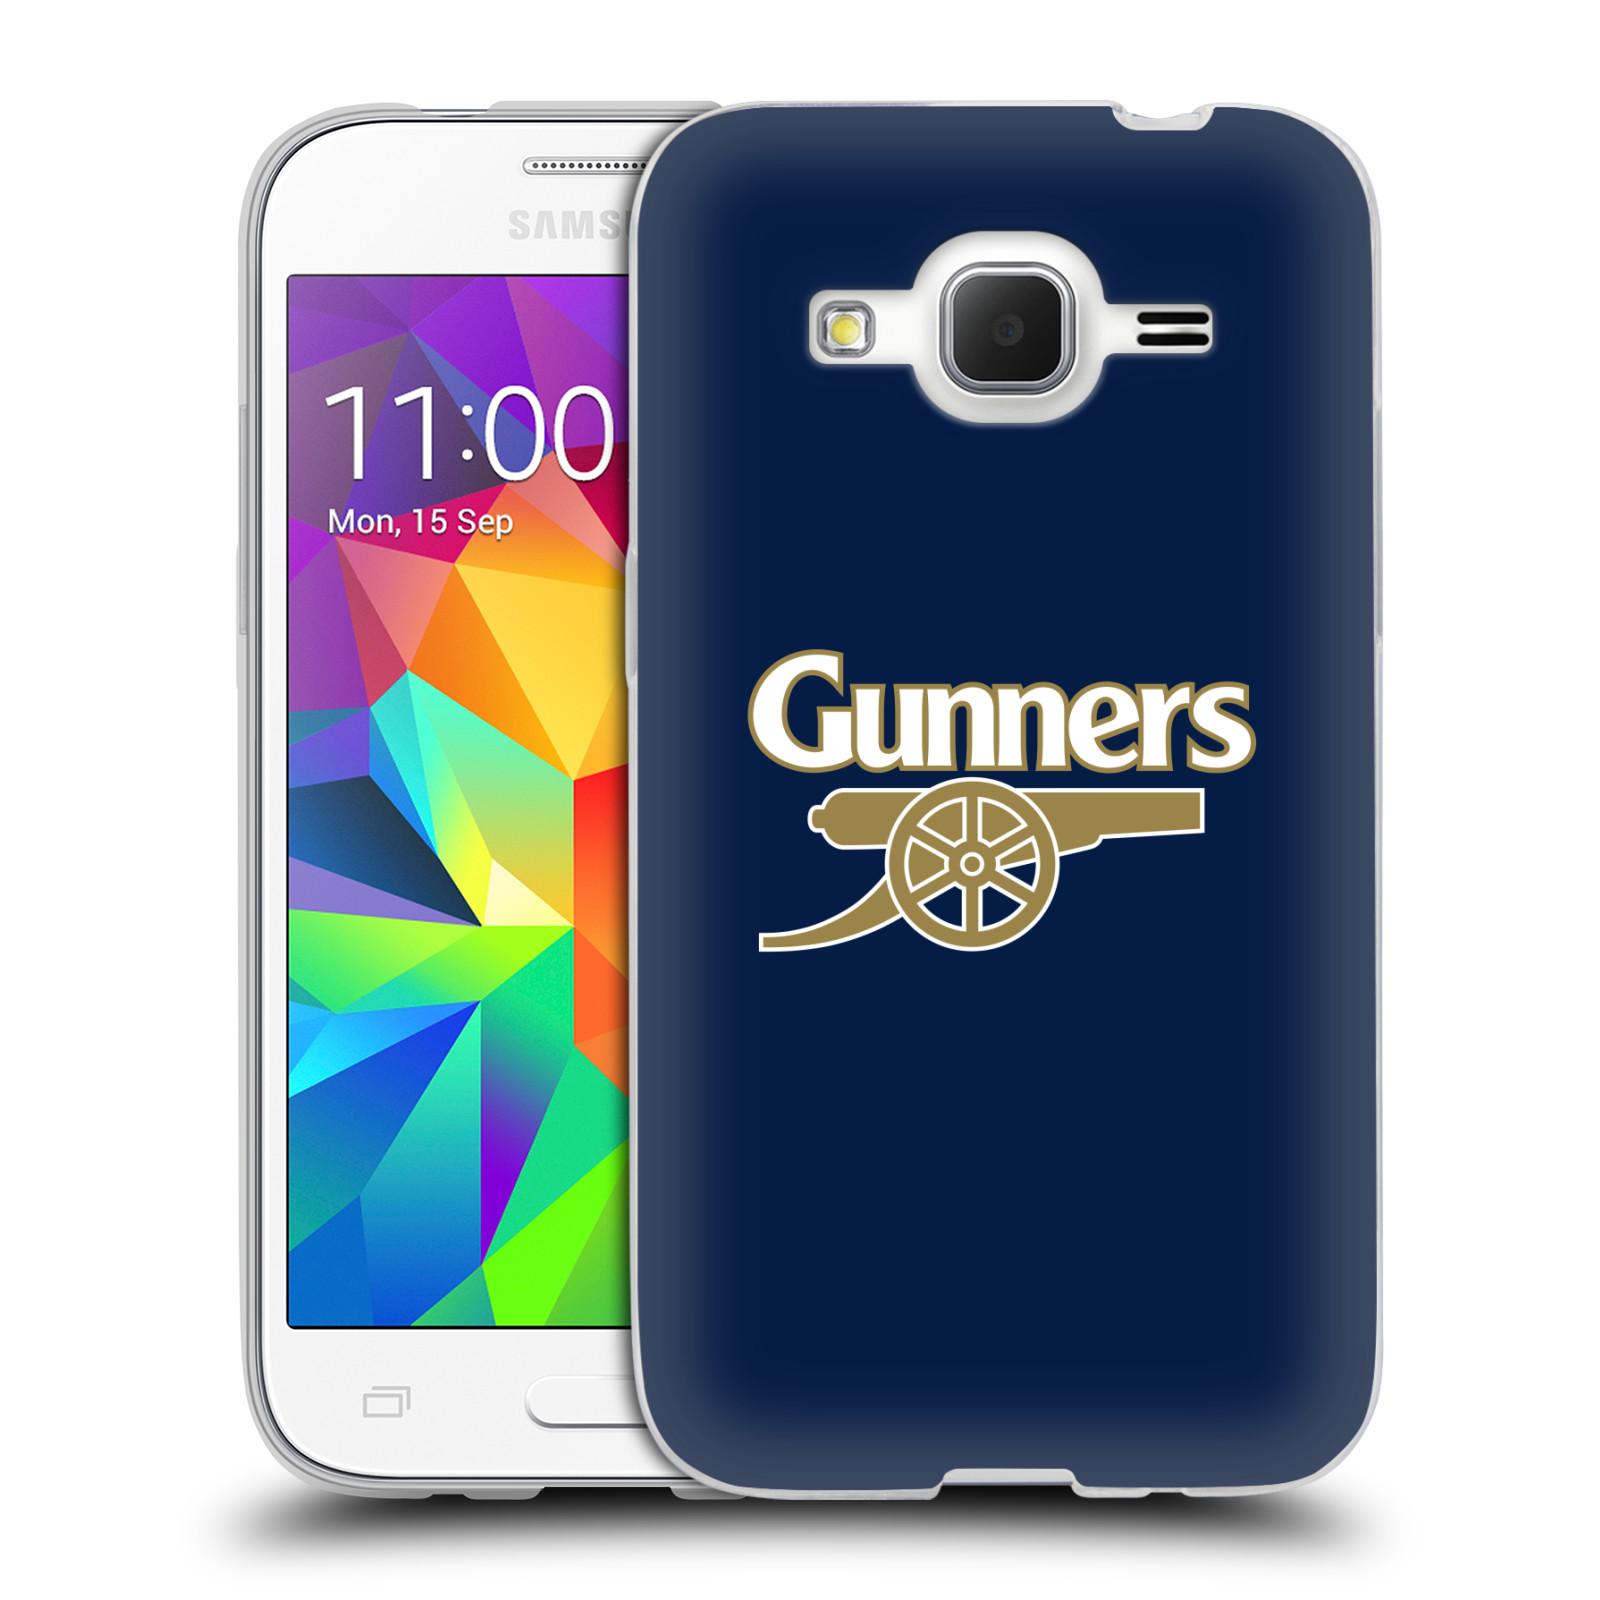 Silikonové pouzdro na mobil Samsung Galaxy Core Prime LTE - Head Case - Arsenal FC - Gunners